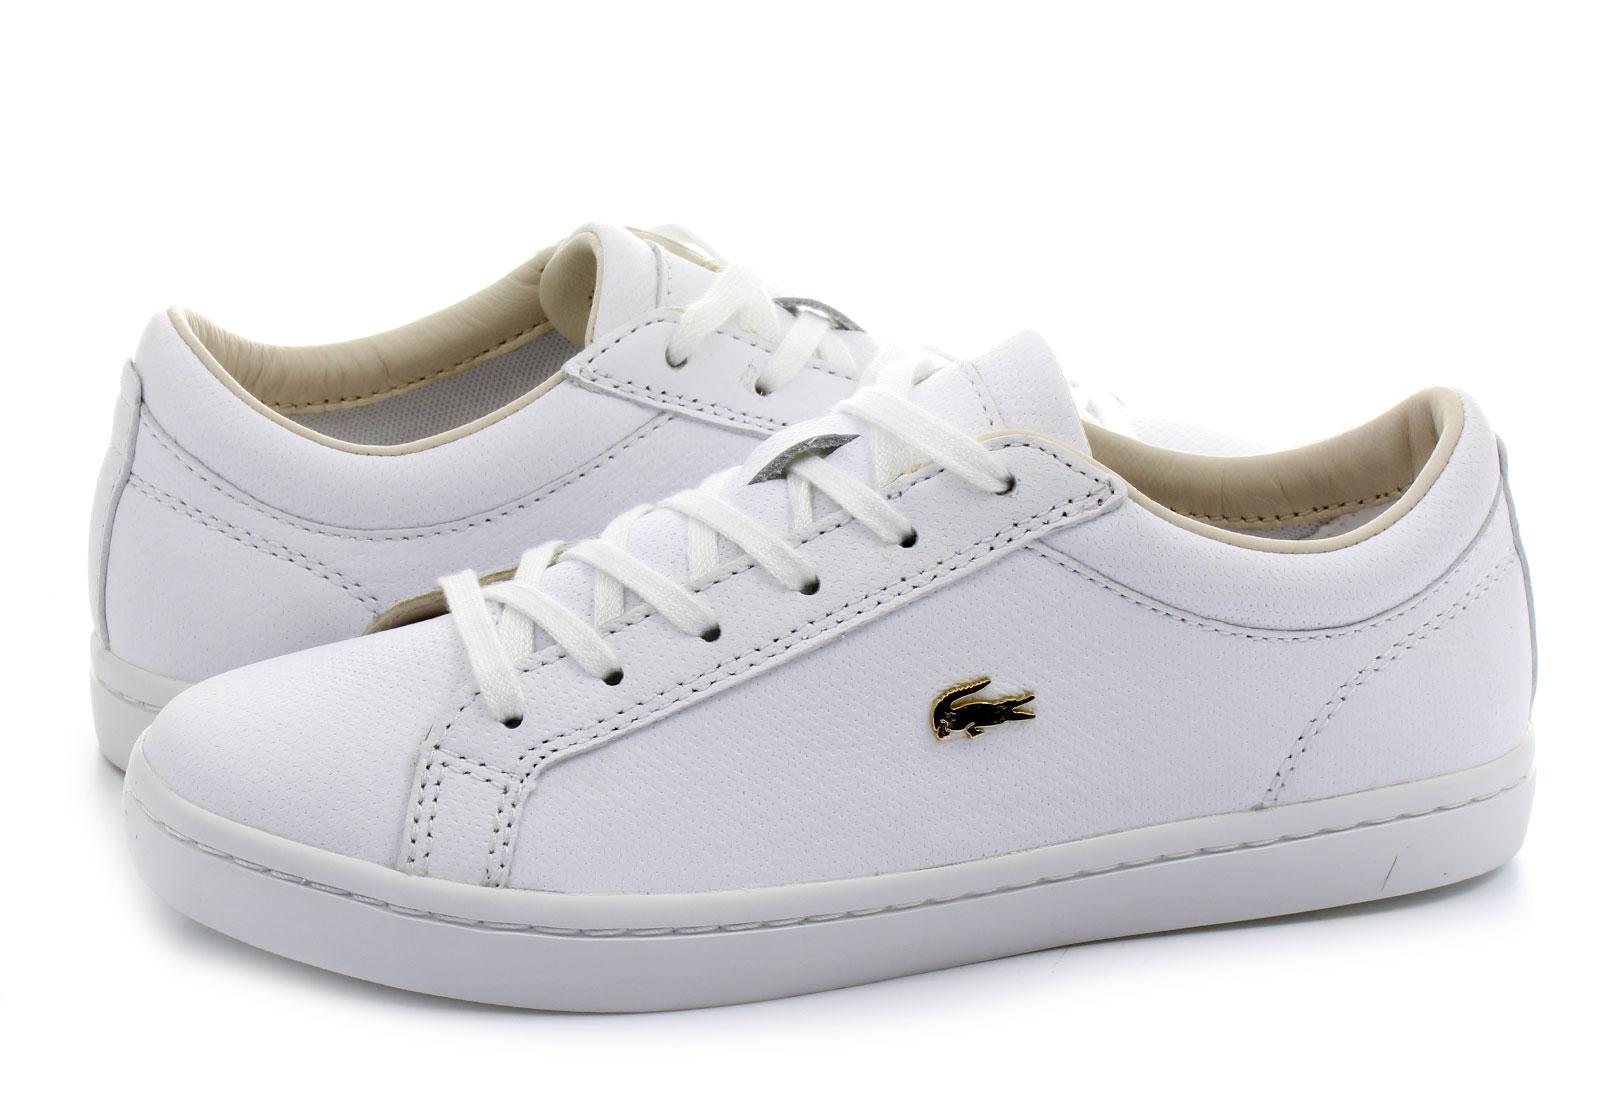 Lacoste Cipő - Straightset 3 - 163caw0146-001 - Office Shoes ... 87d940662c